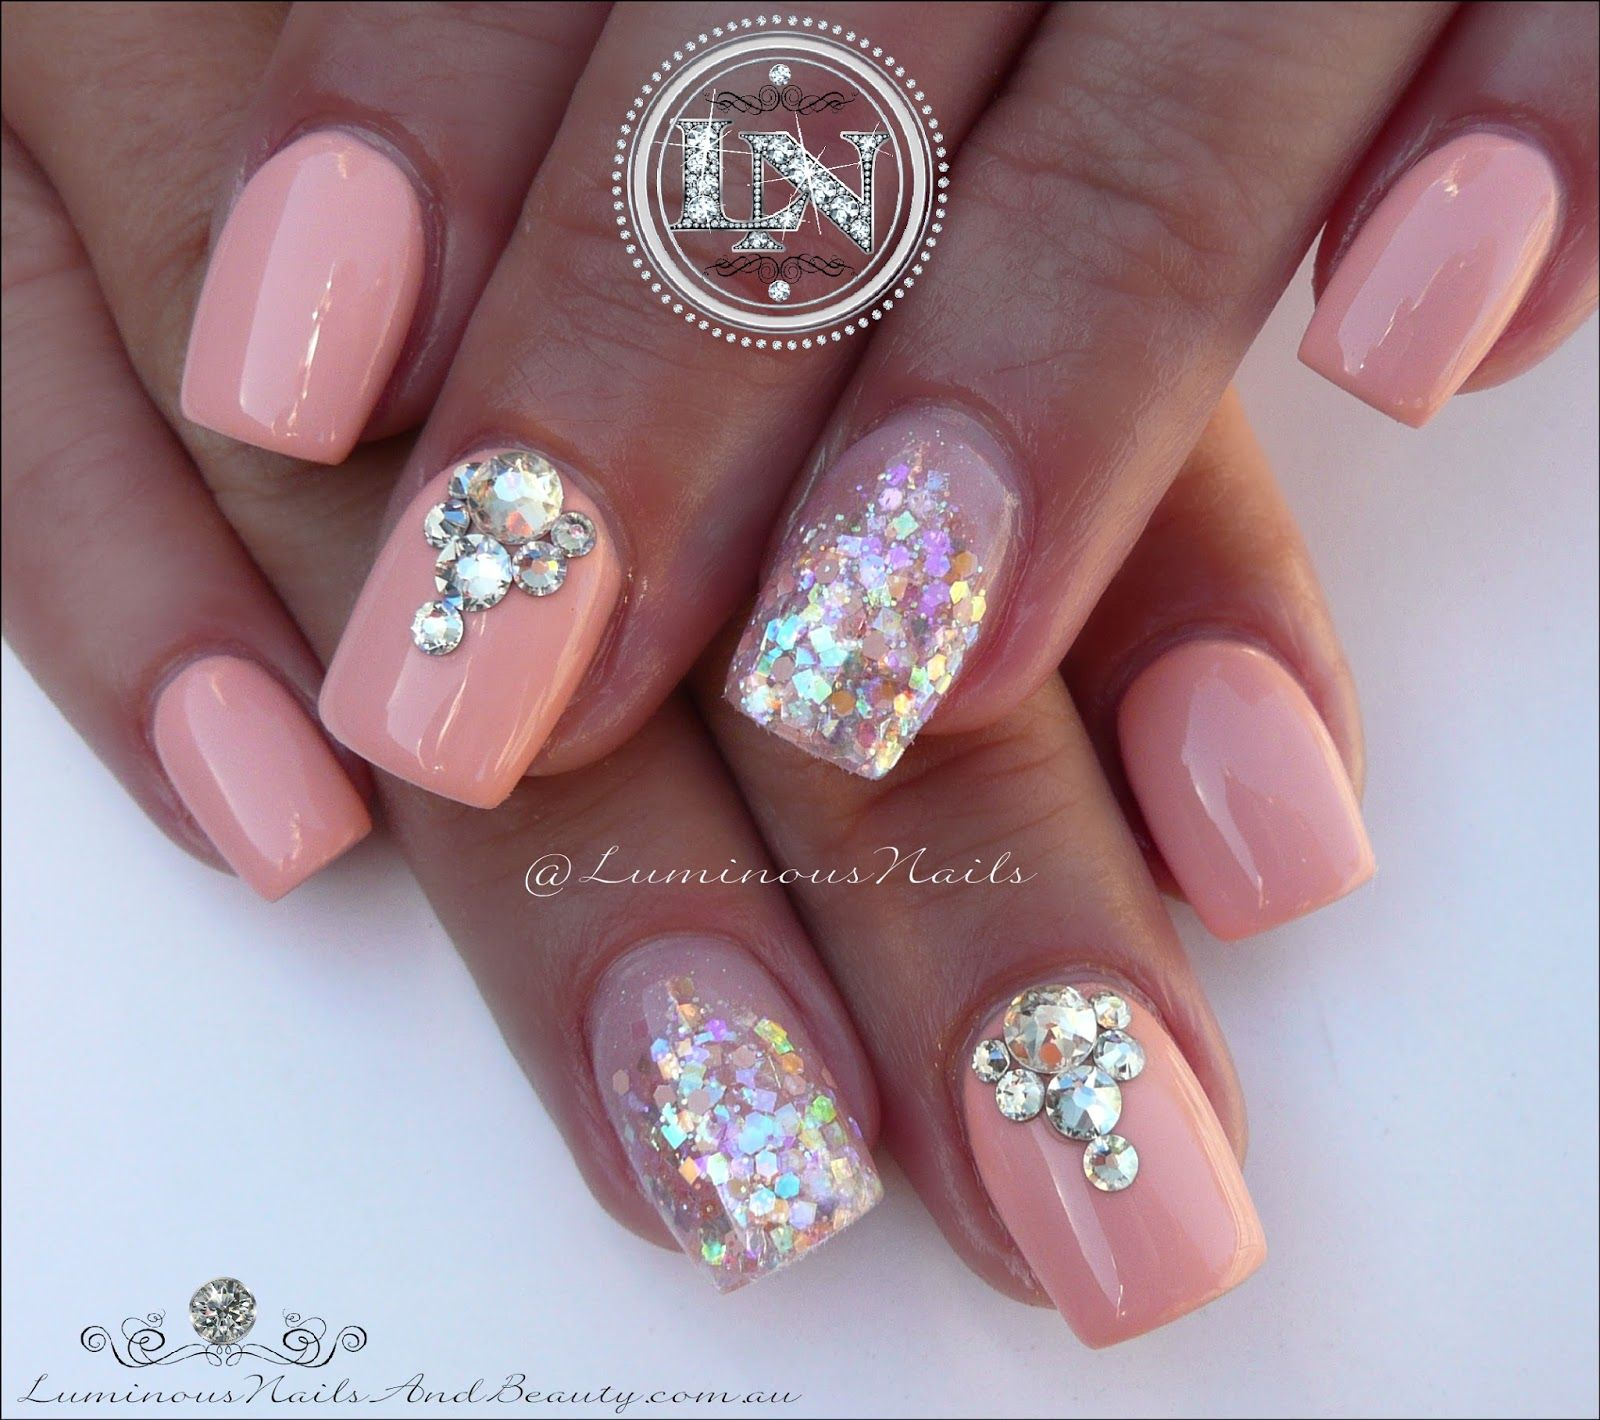 Luminous Nails: Peachy Marshmallow Acrylic & Gel Nails | Nail ...